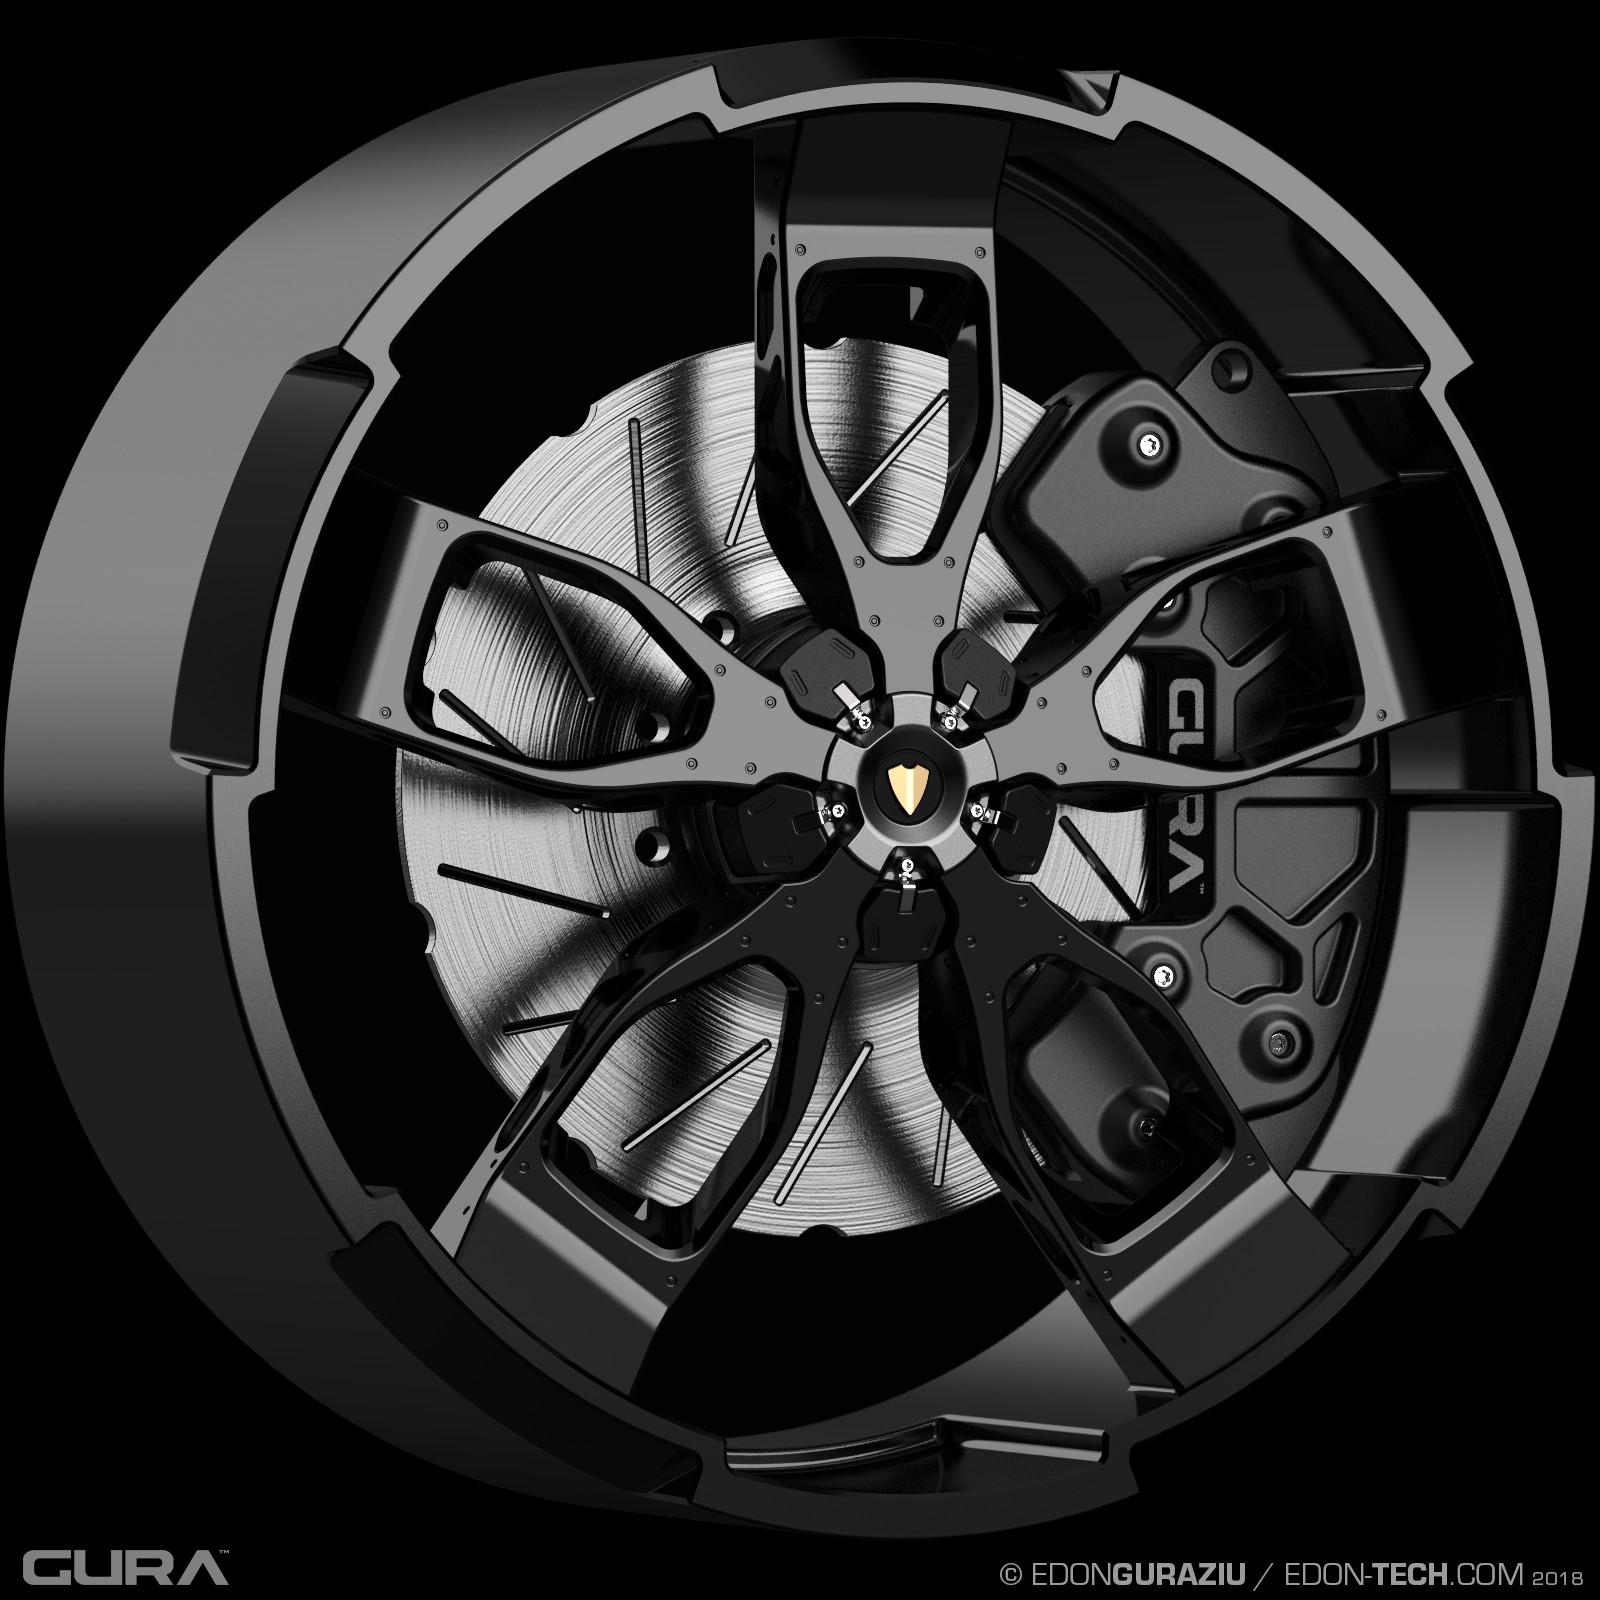 Edon guraziu gura black wheel 002